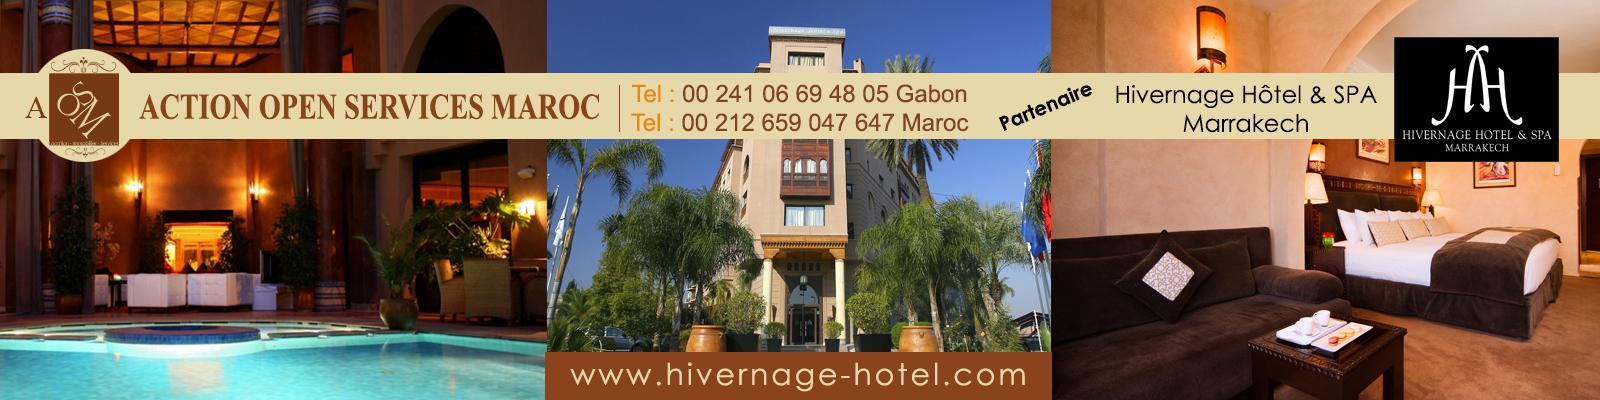 Hivernage, hotel SPA